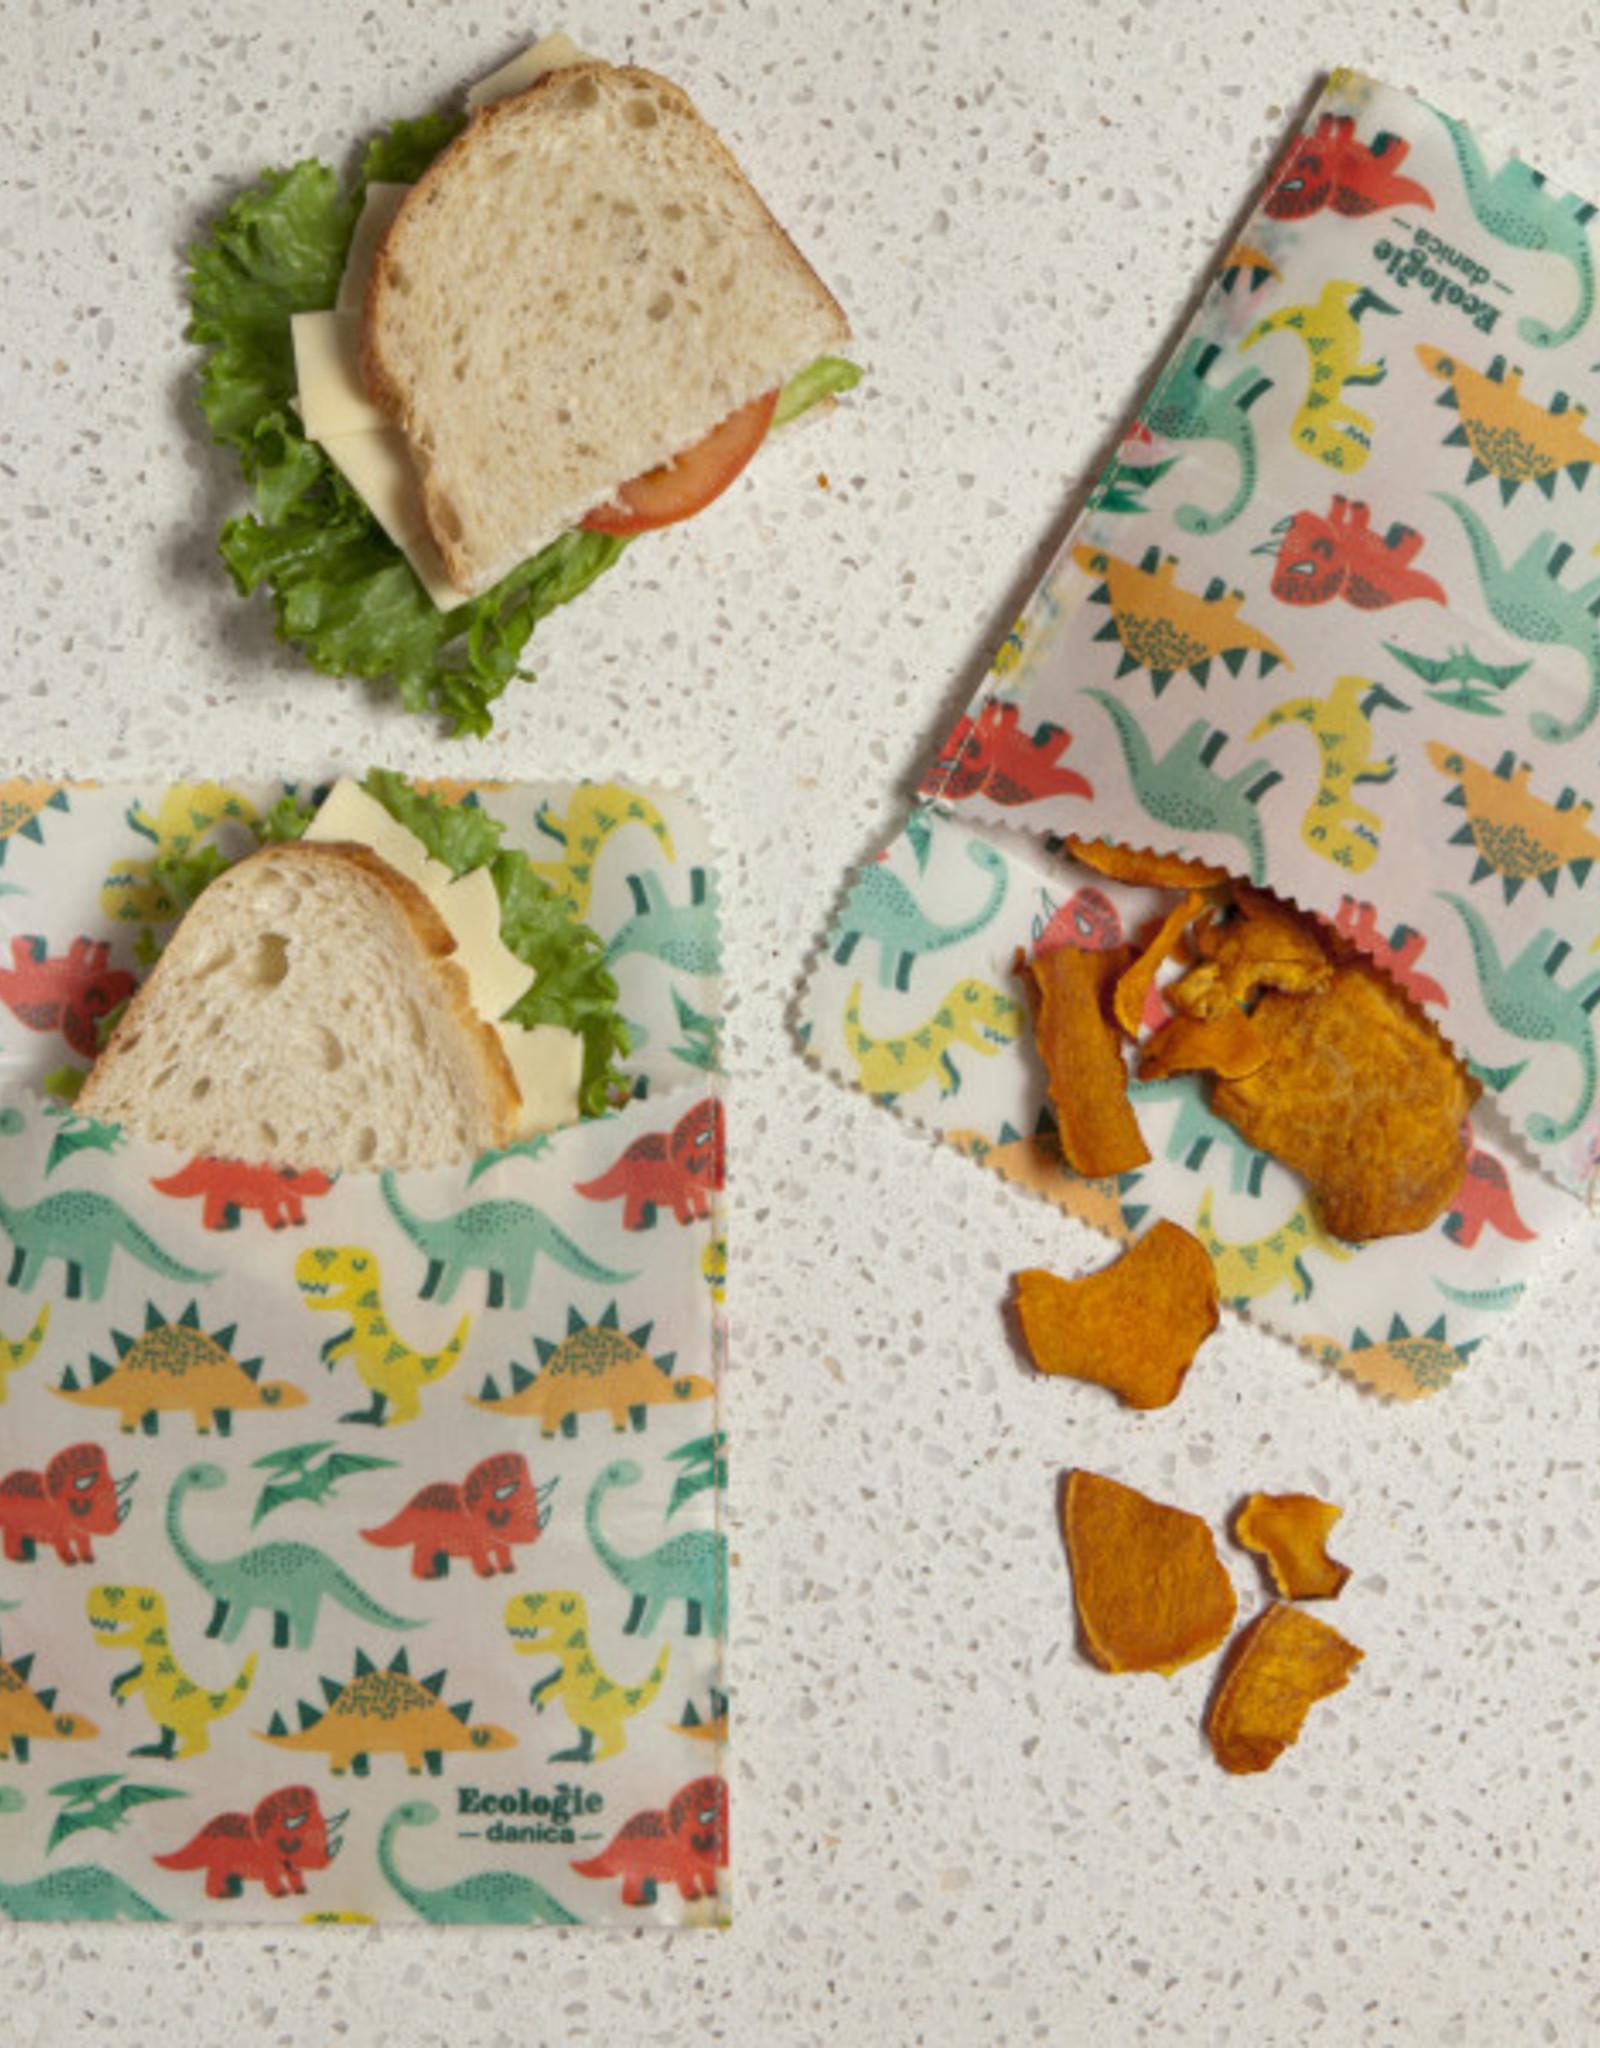 Danica Danica Beeswax Sandwich Wrap- Dandy Dinos Set 2